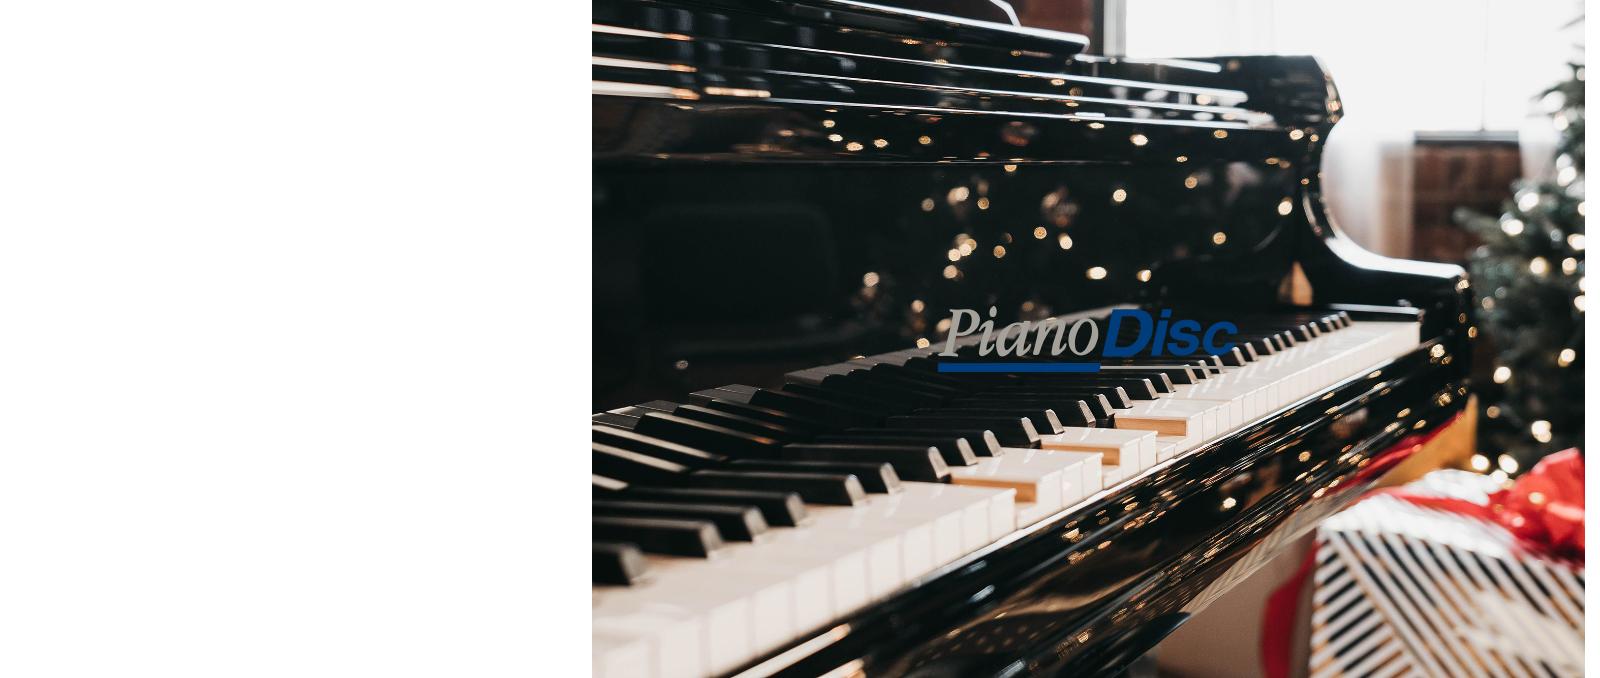 Christmas-Pianodisc-2019-2k